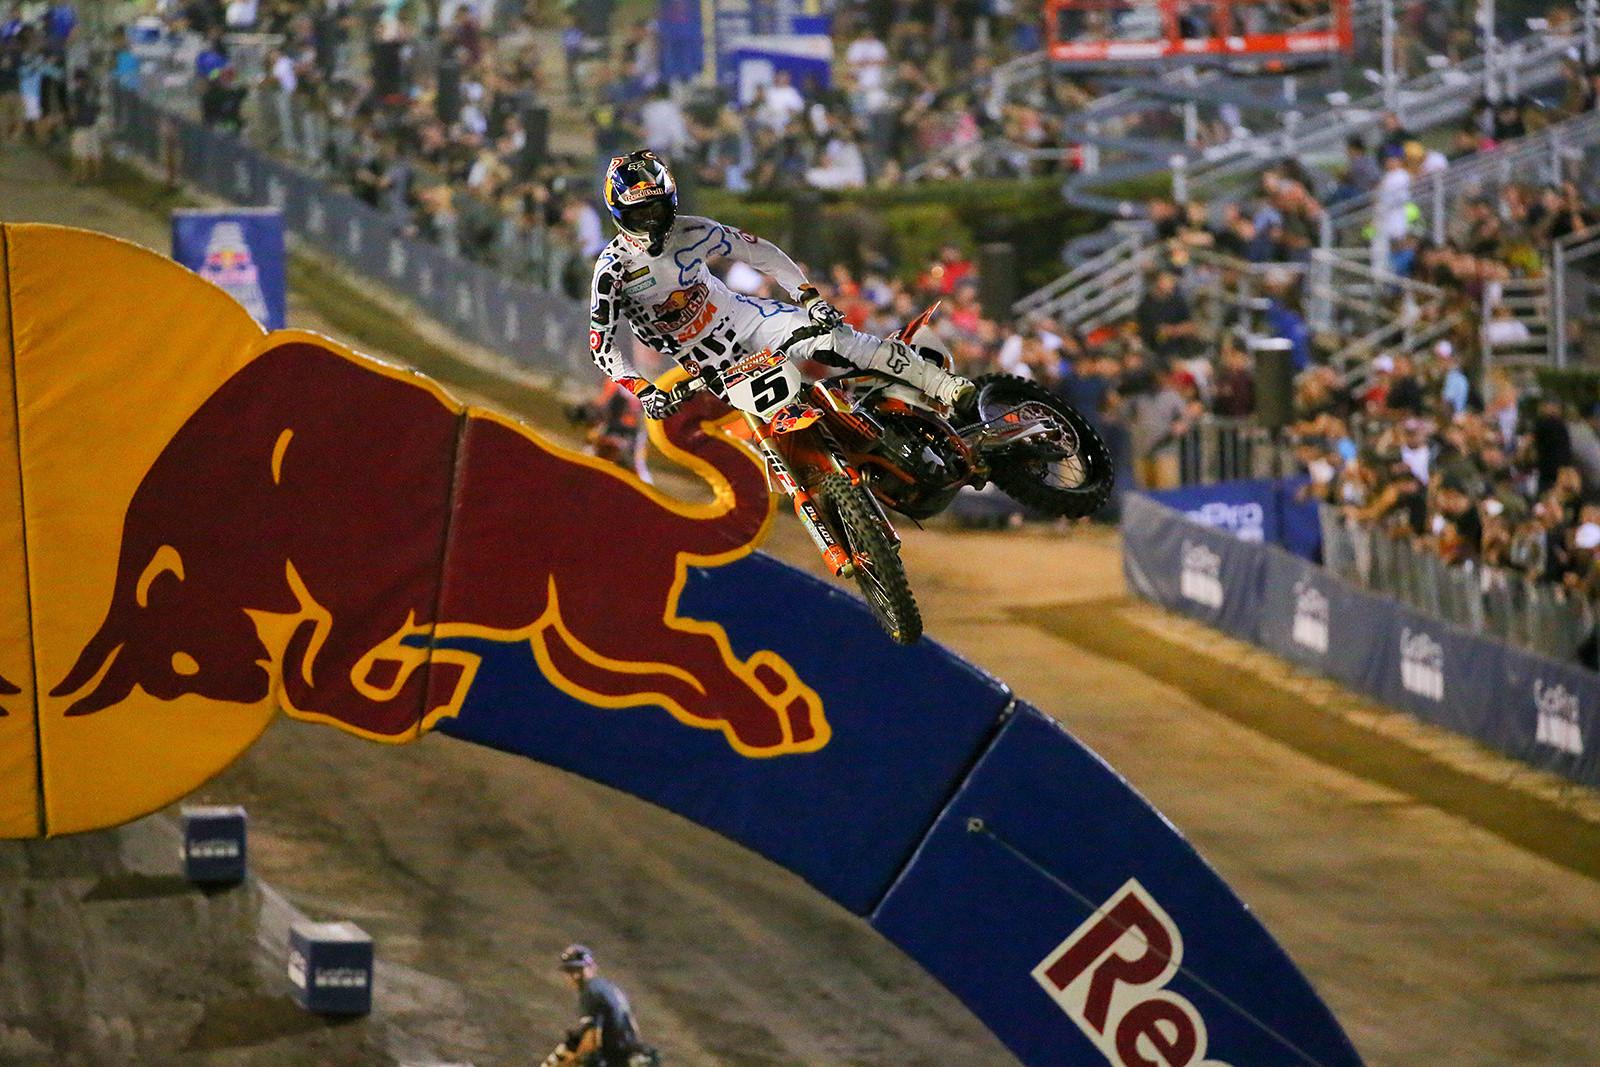 Ryan Dungey - Photo Blast: Red Bull Straight Rhythm - Motocross Pictures - Vital MX